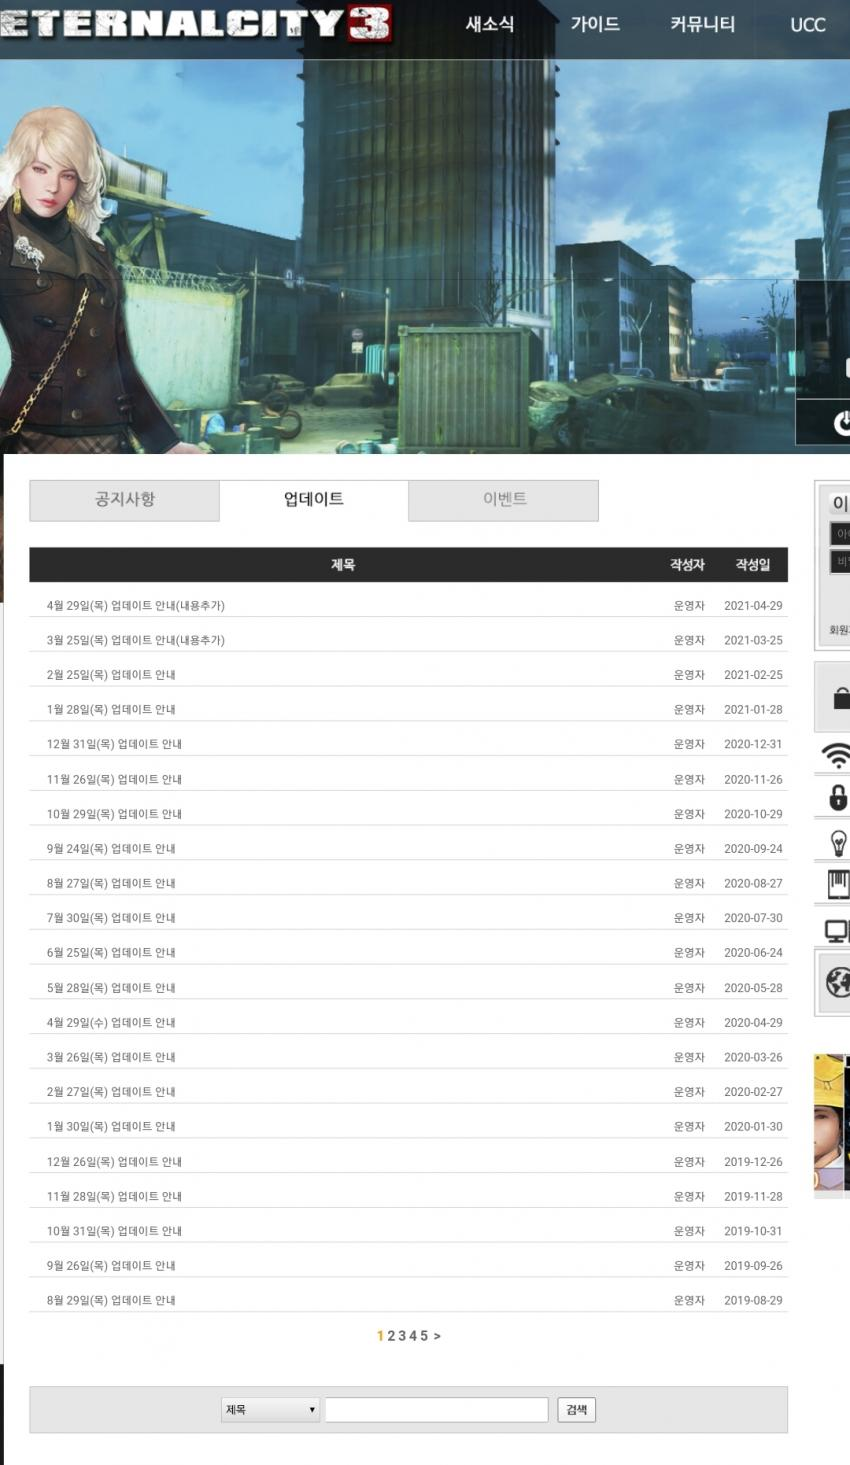 viewimage.php?id=2fb9&no=24b0d769e1d32ca73fec8efa11d02831835273132ddd61d36cf617d09c4fd54dcf41bf110023a59ba4fdacb14e63d35126f8db8d23910f7539996cf2fd